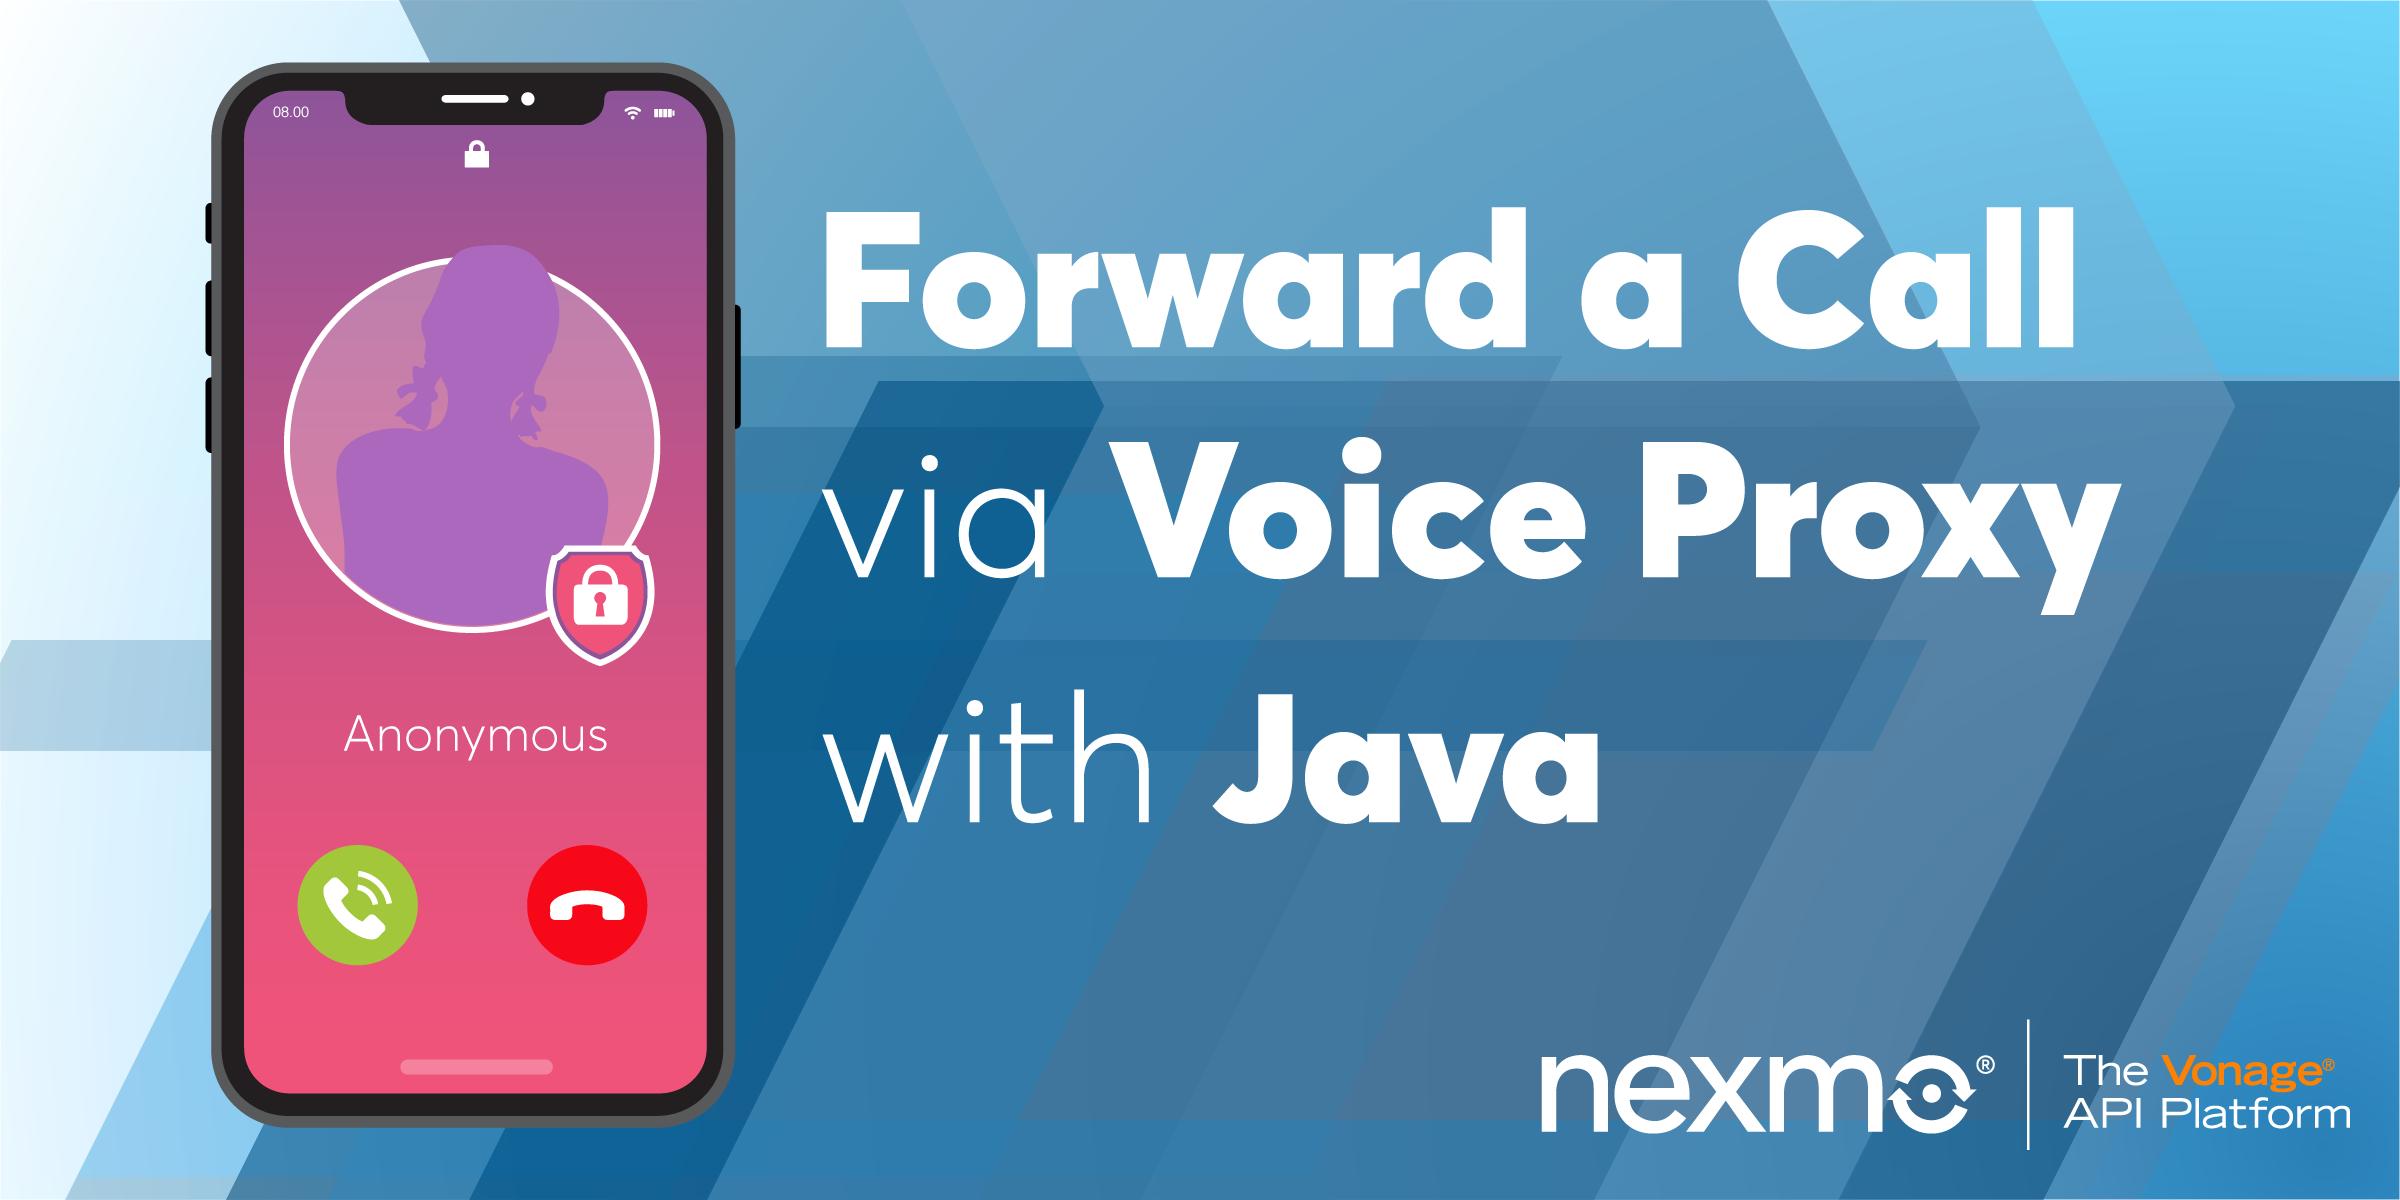 Forward a Phone Call via Voice Proxy with Java